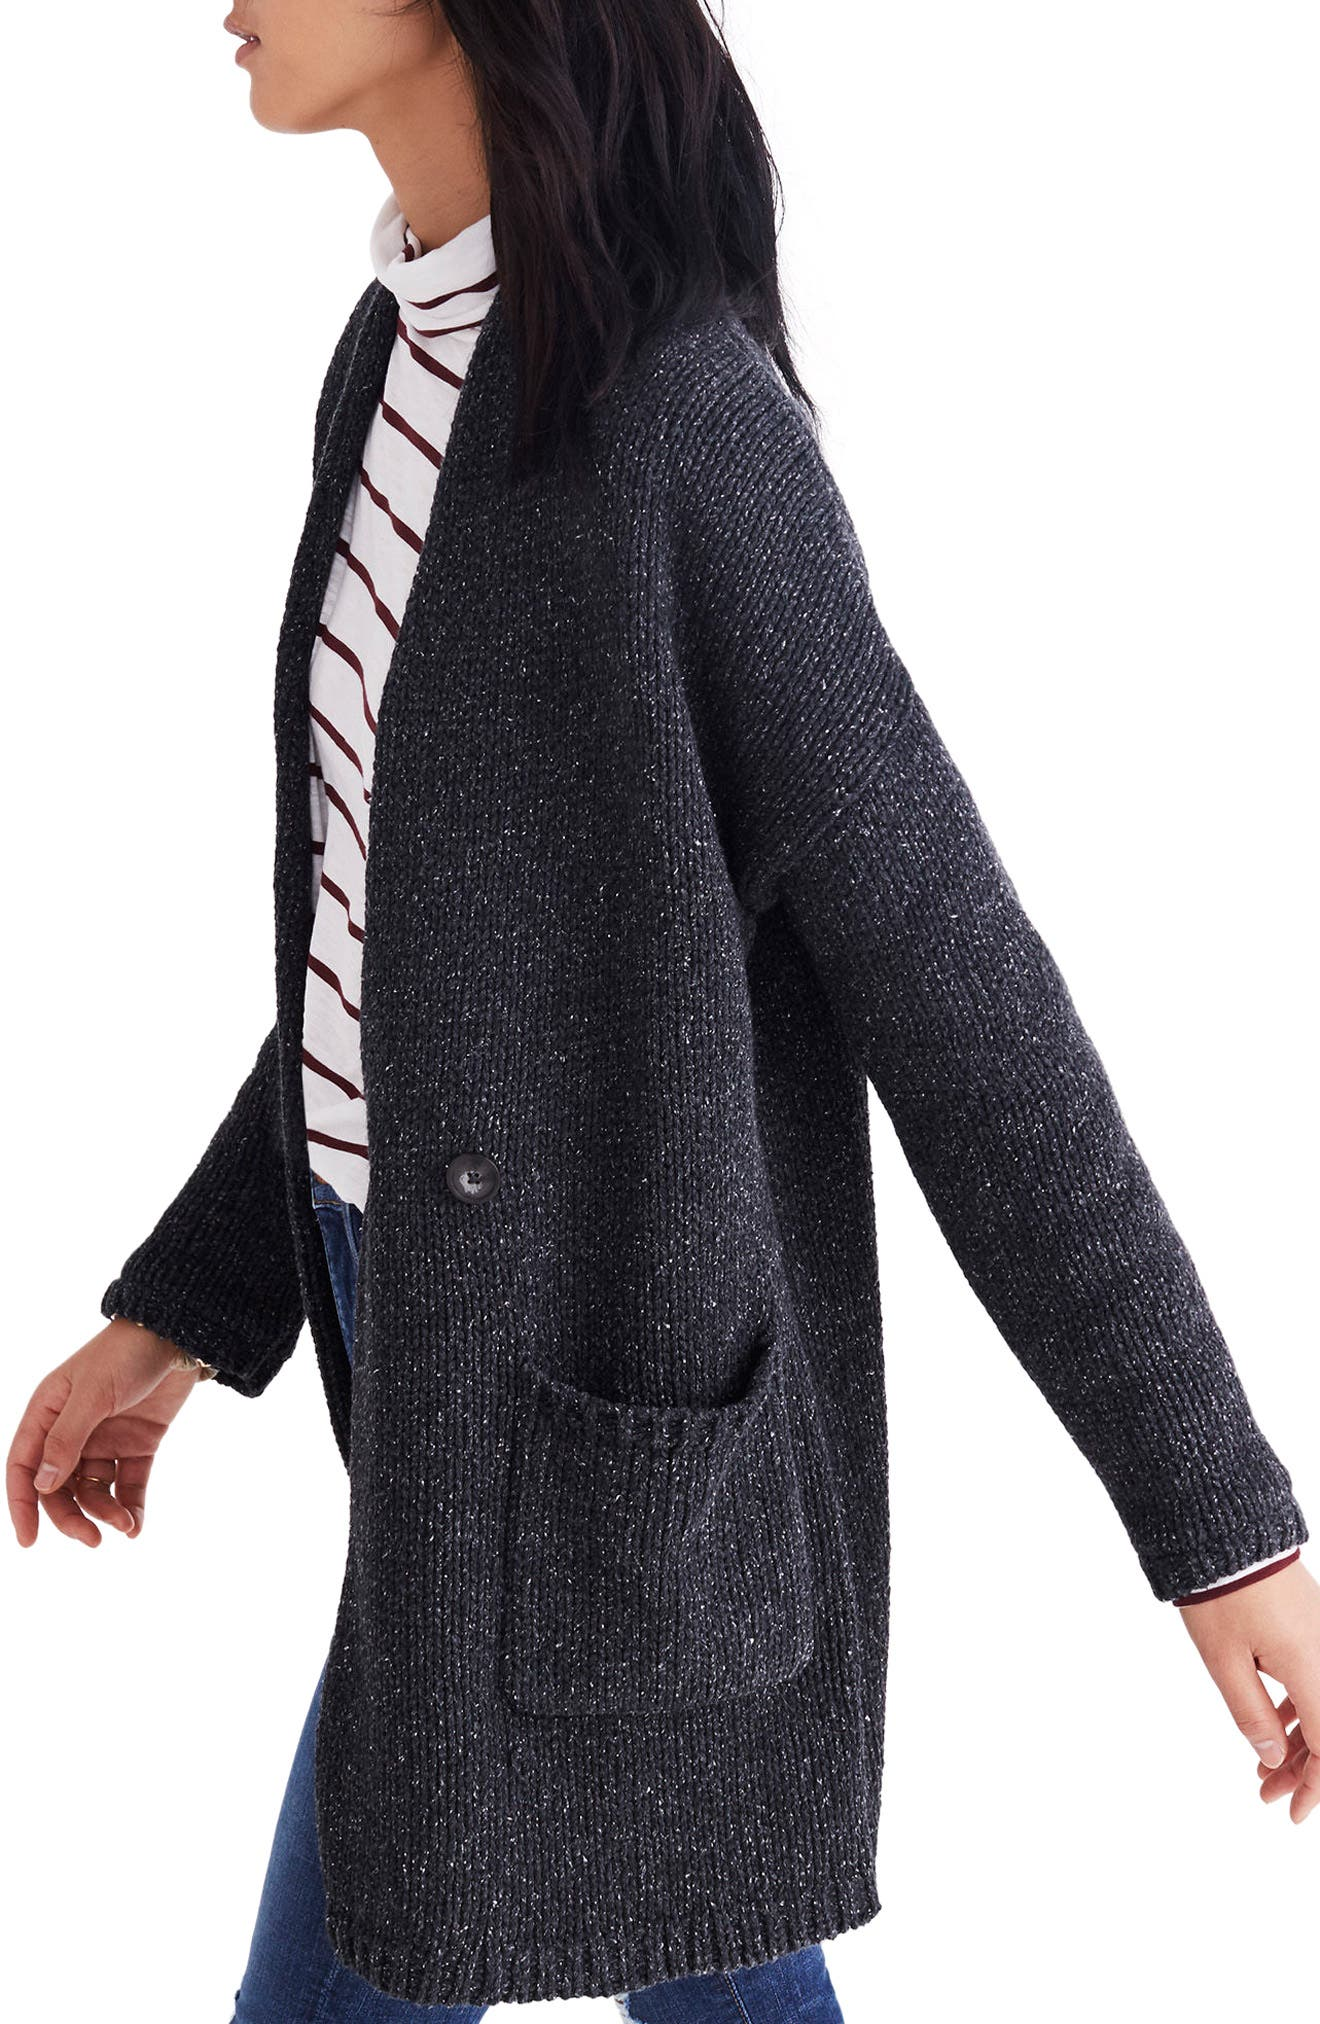 Glenhill Sweater Coat,                             Alternate thumbnail 3, color,                             001